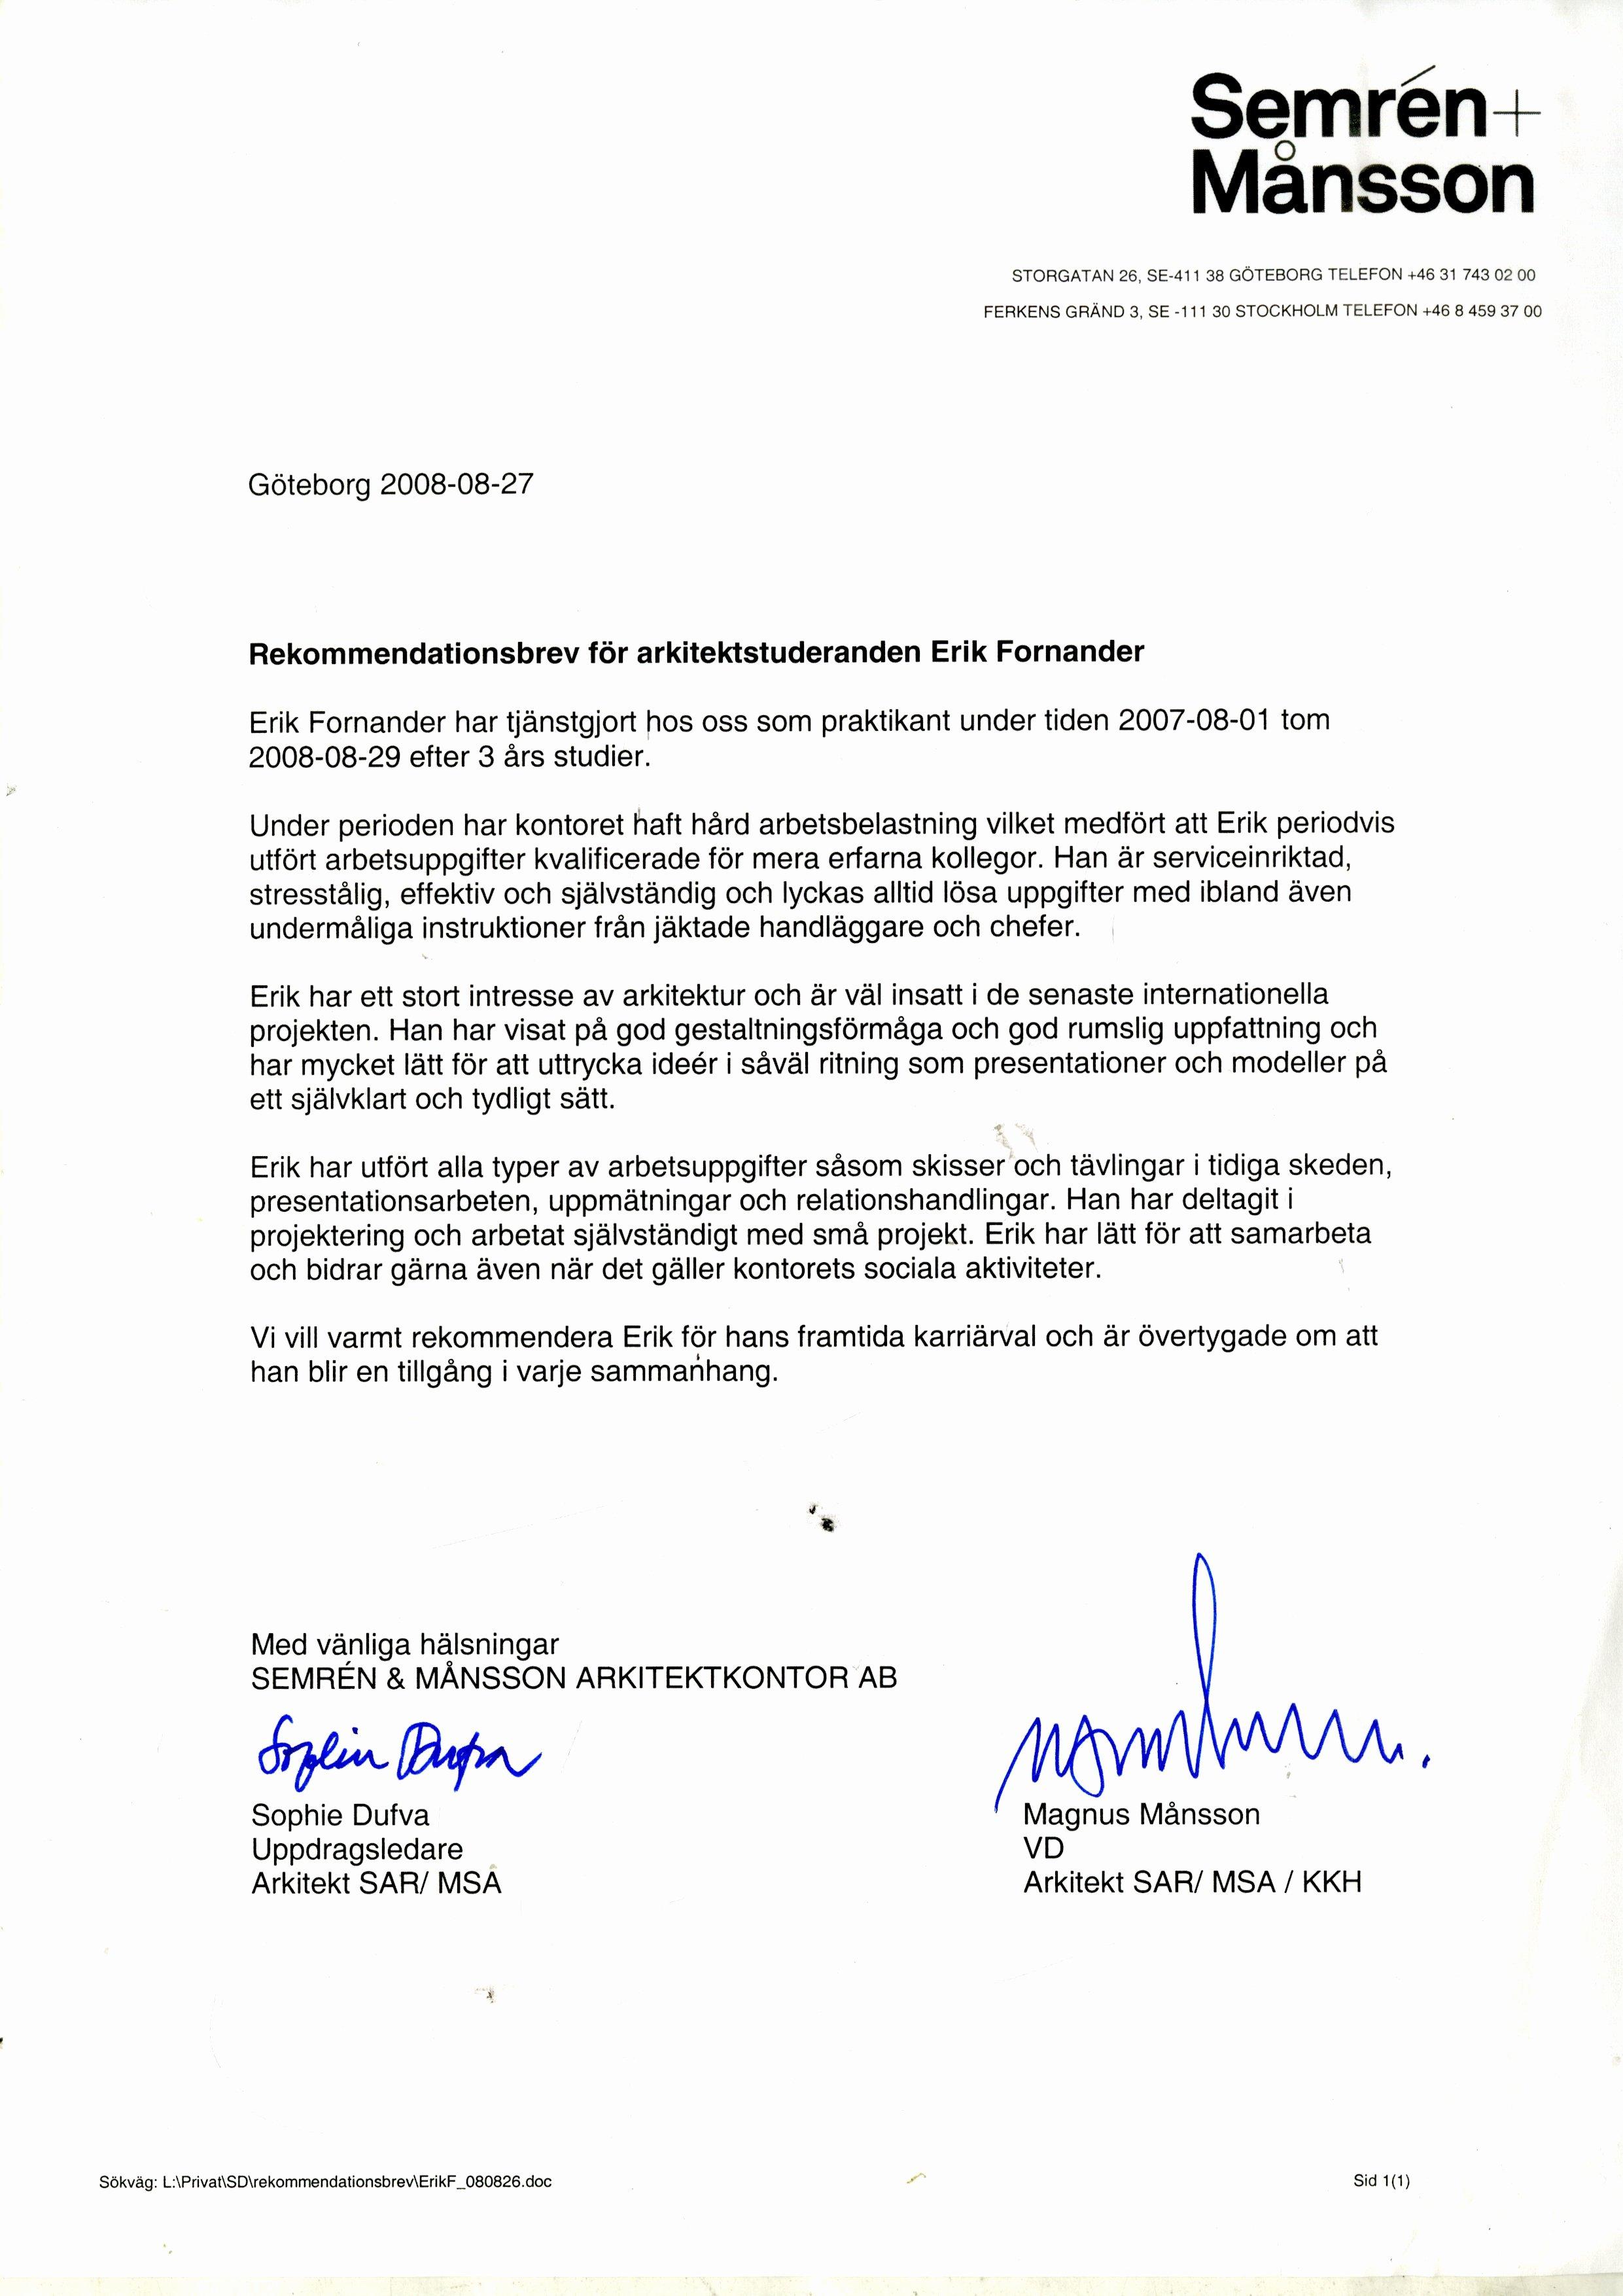 Internship Recommendation Letter Sample New Re Mendation Letter